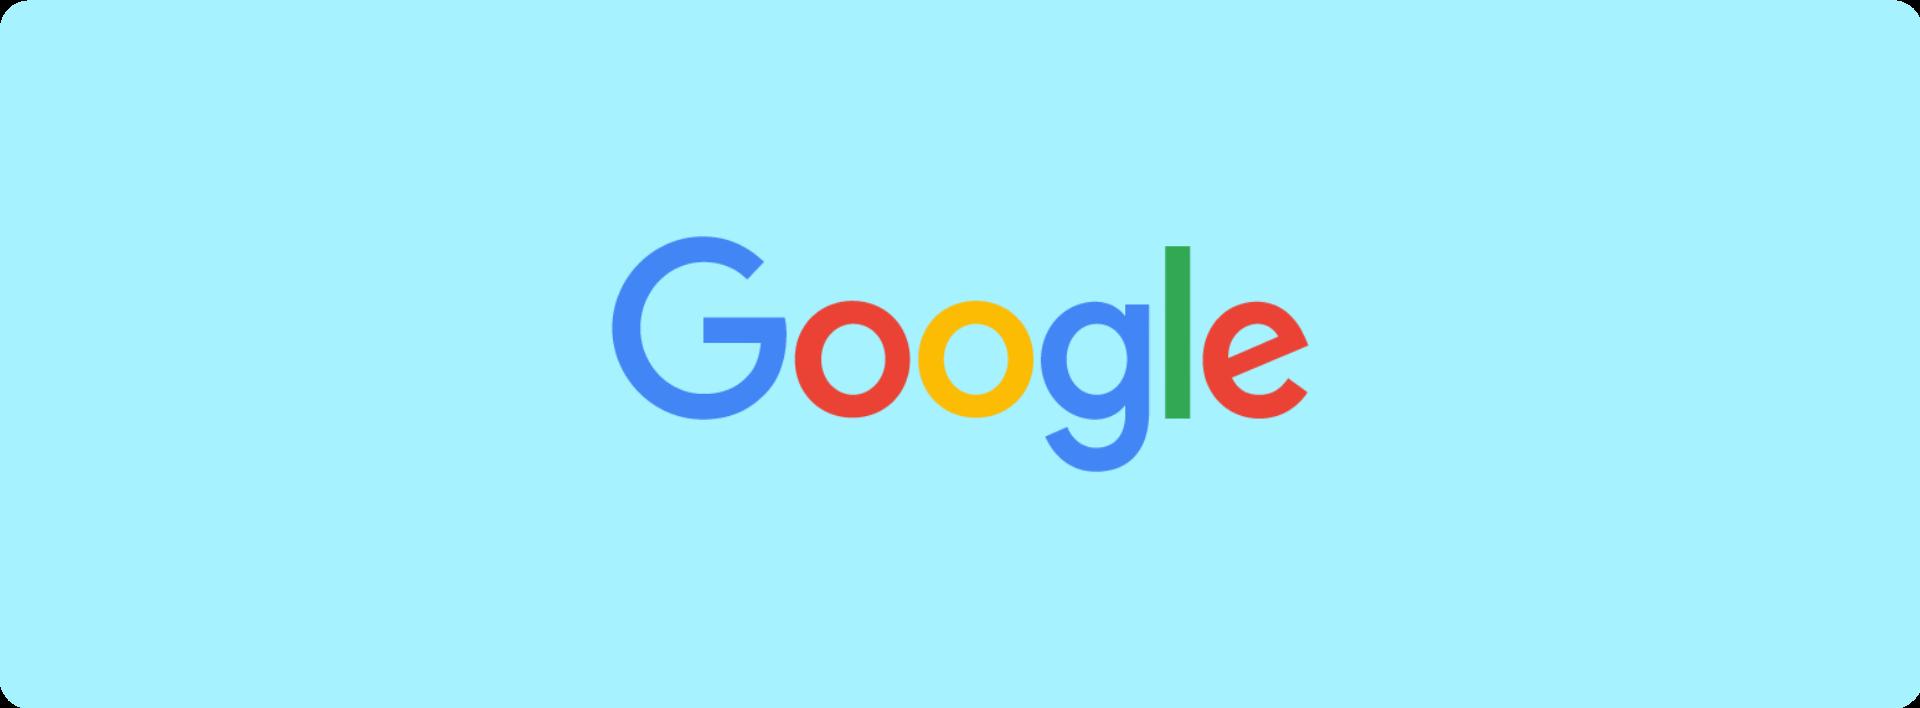 Google Image, Education Perfect